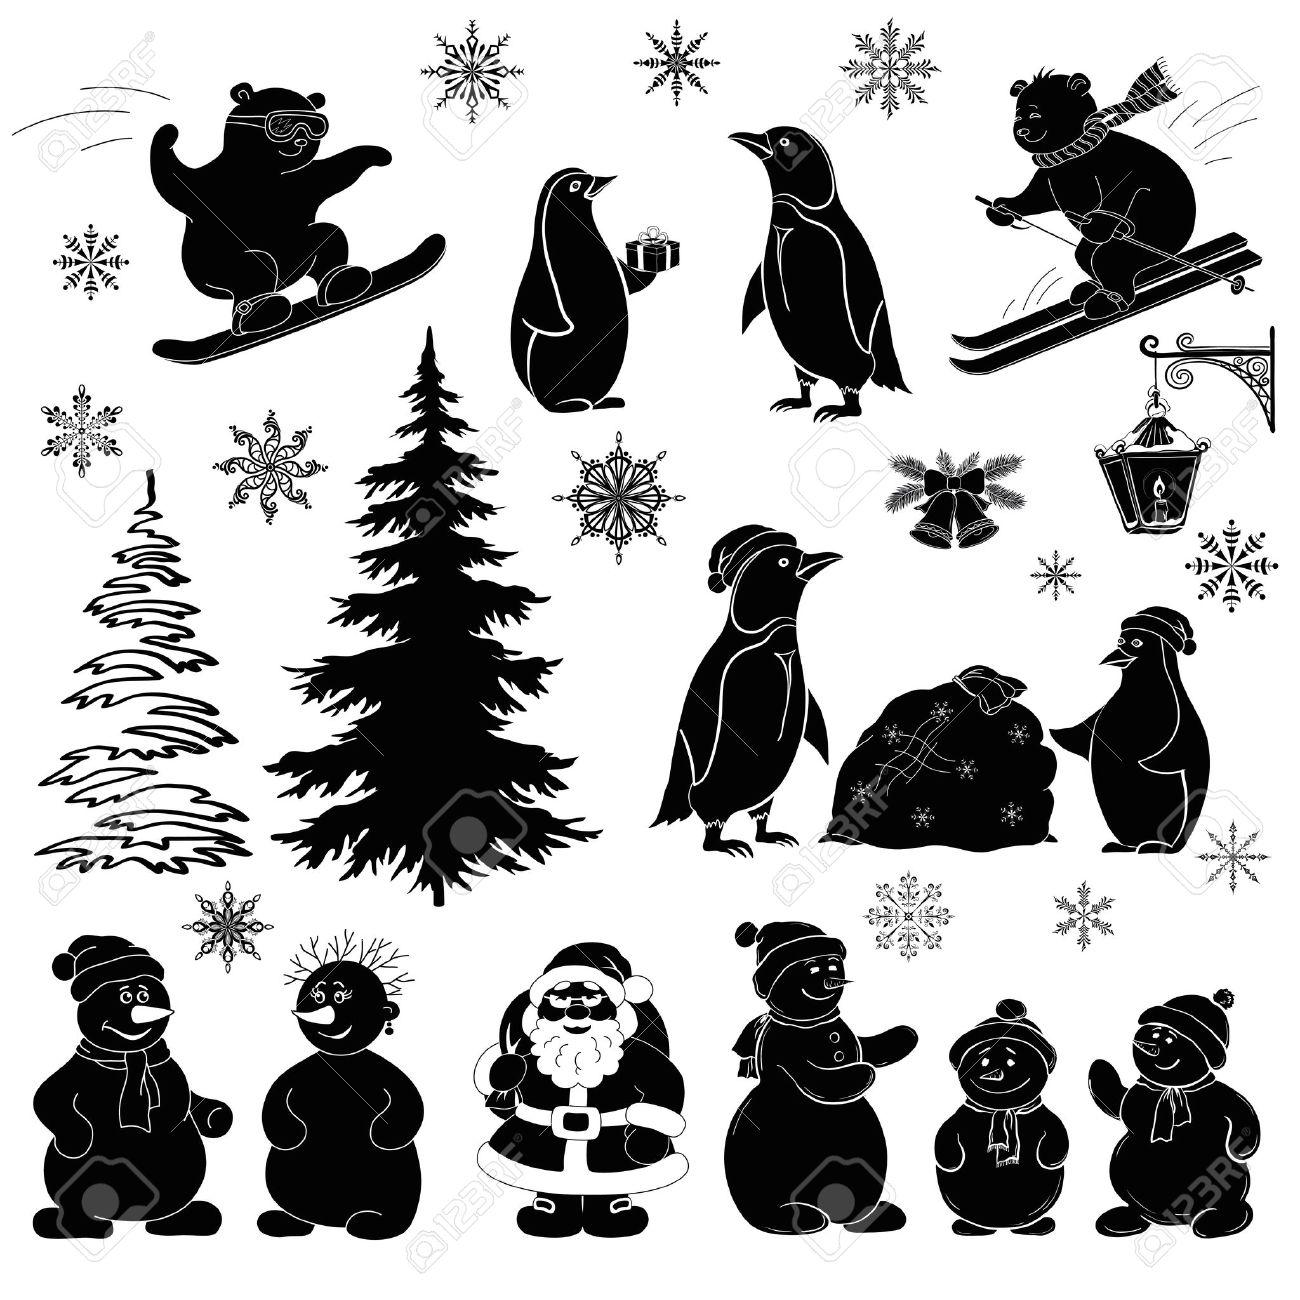 Christmas cartoon, set black silhouettes on white background Santa Claus, fir tree, teddy bears, penguins, sportsmans, snowflakes, lantern Vector - 15471340